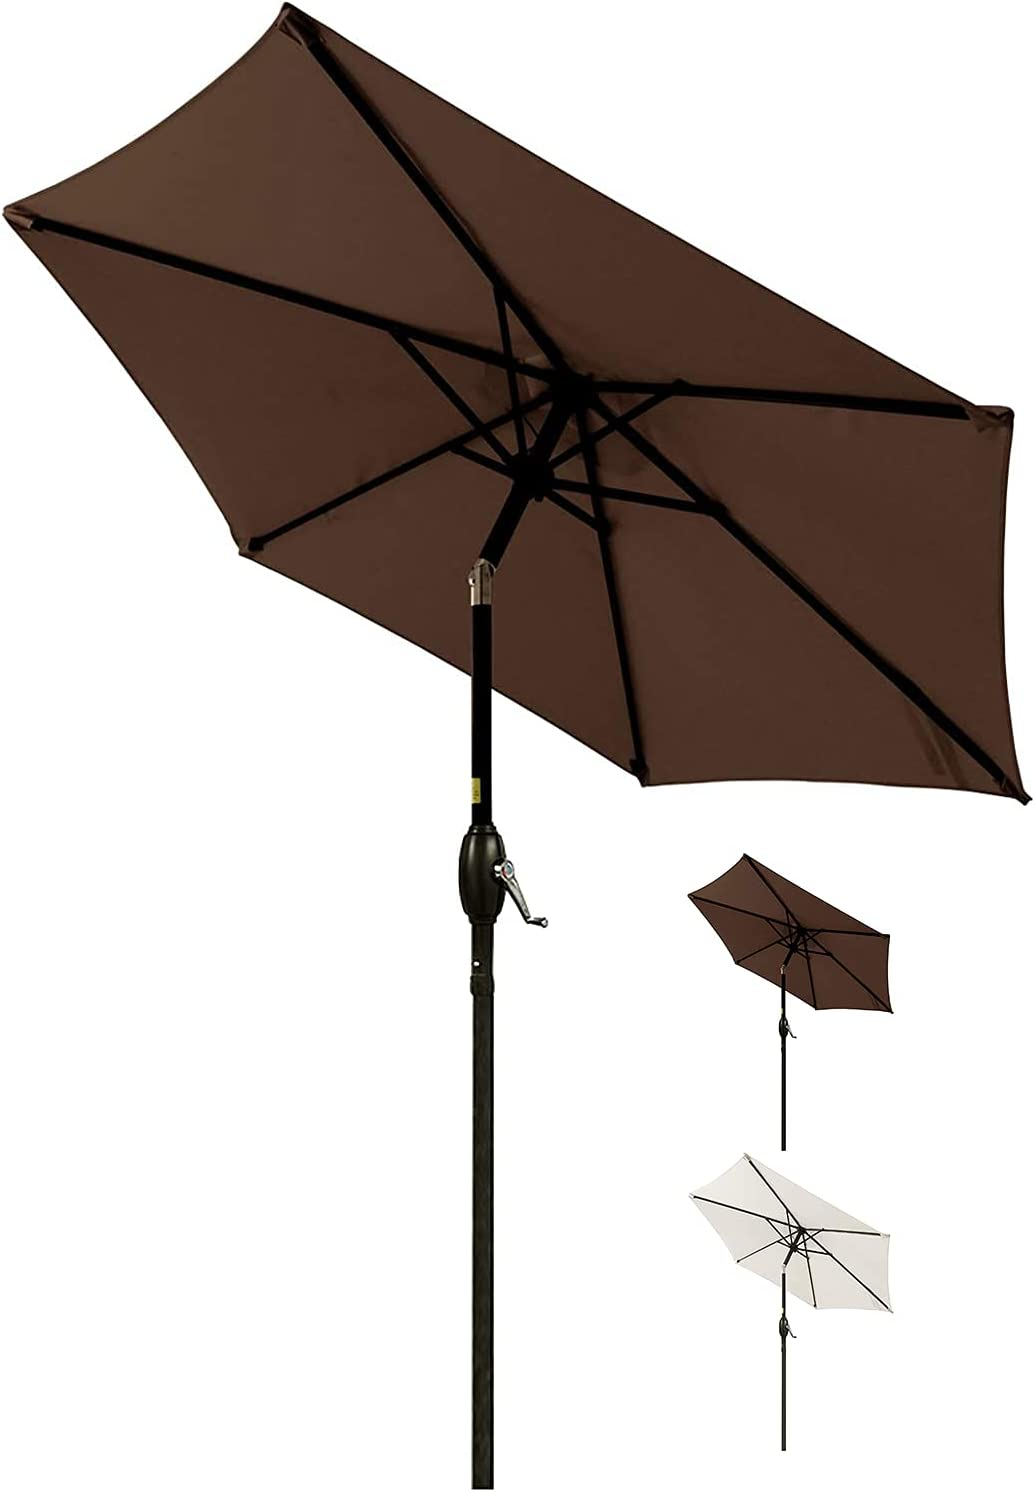 SFJ-CA 7.5 FT Patio Umbrella Outdoor Small Sunbrella Nashville-Davidson Mall Tilt Table Translated